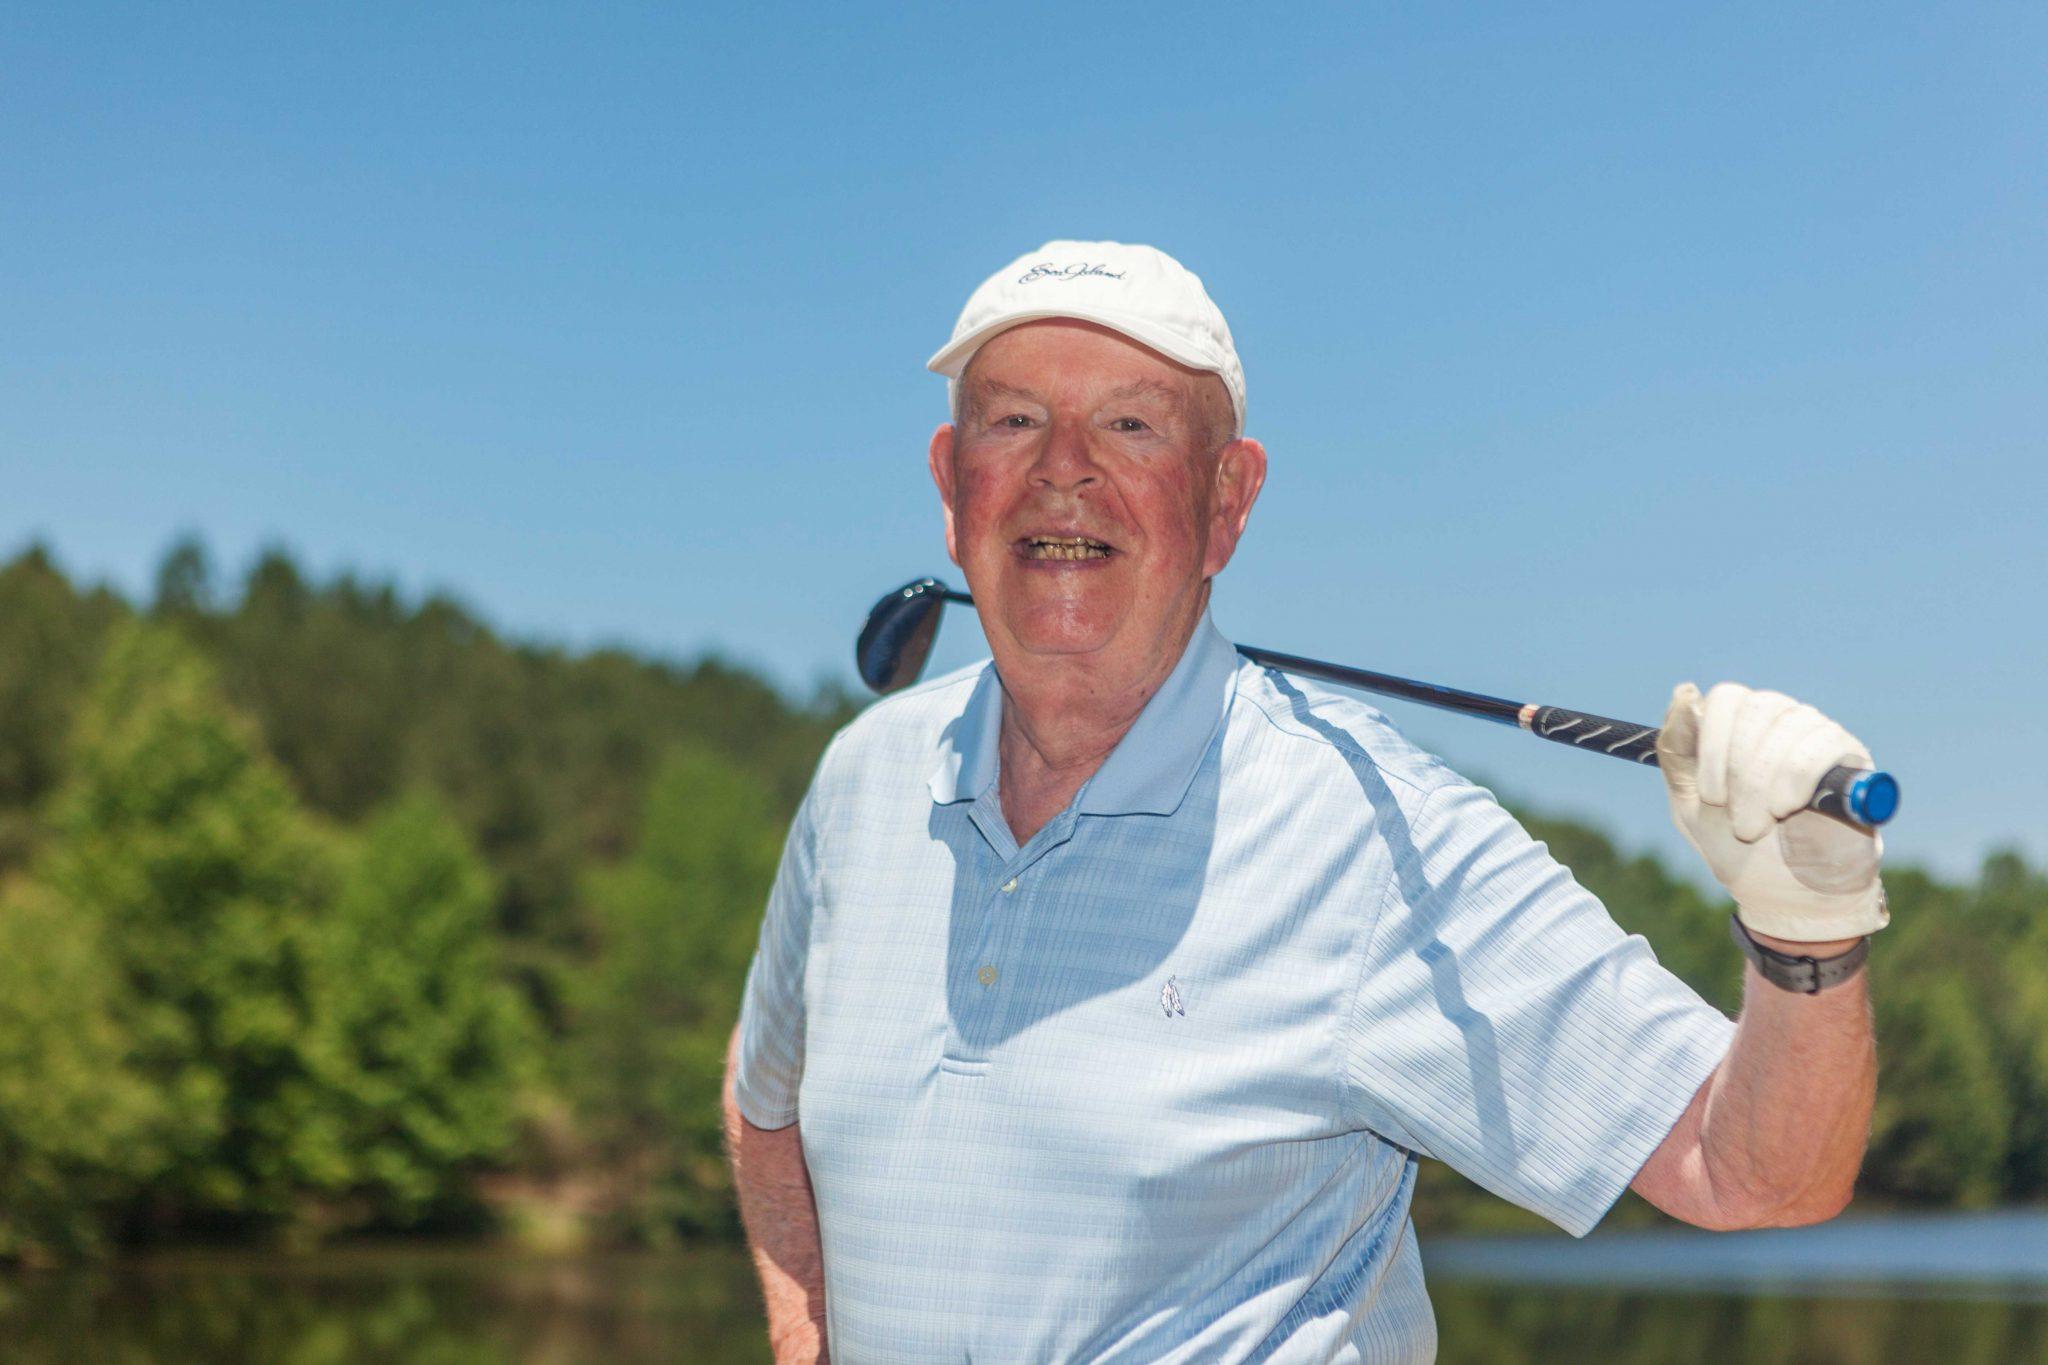 man-enjoys-golfing